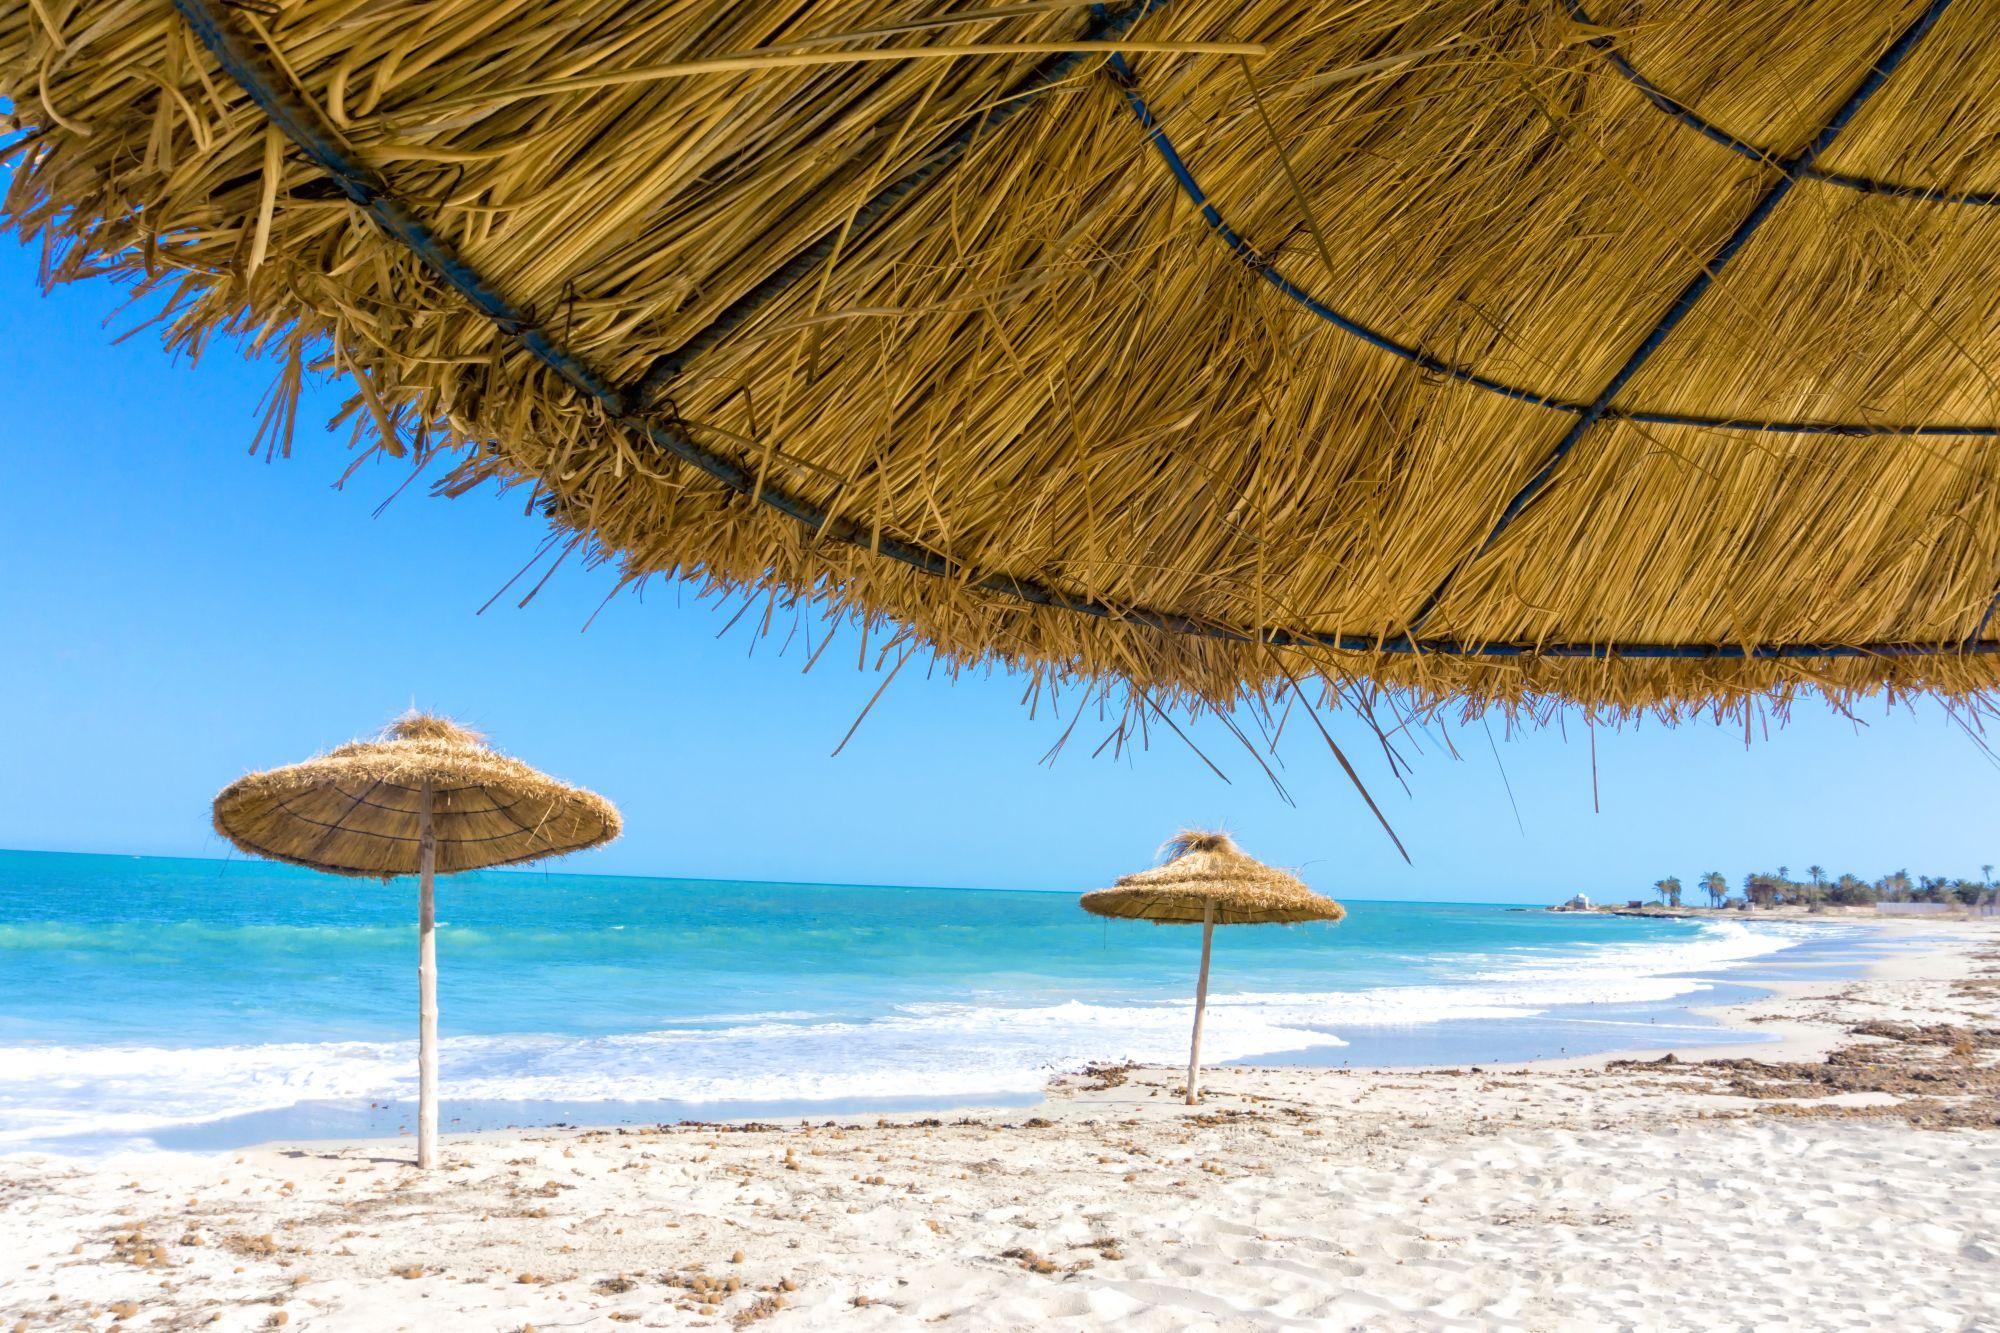 Parasole na plaży